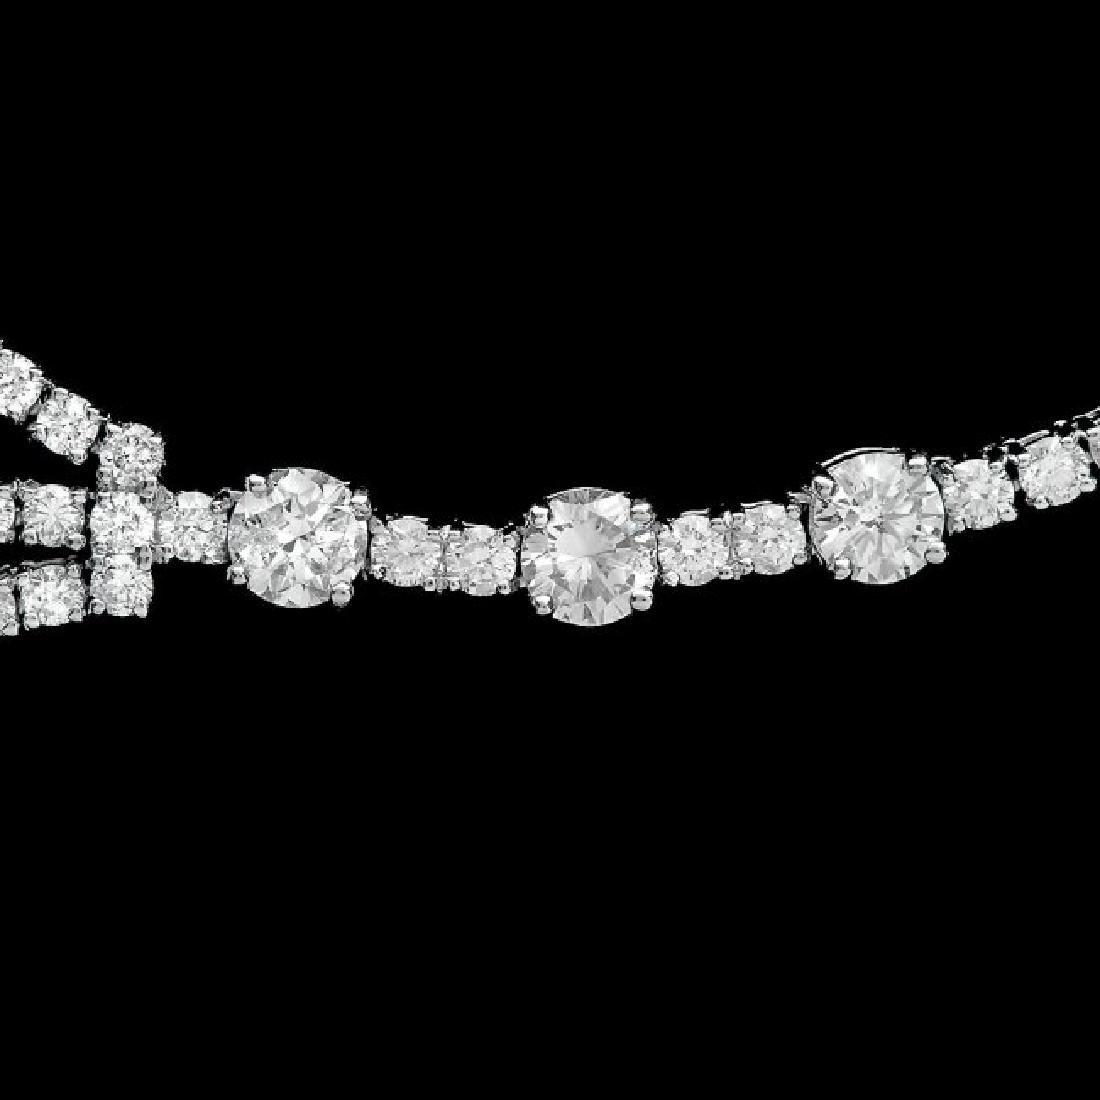 18k White Gold 12.90ct Diamond Necklace - 4